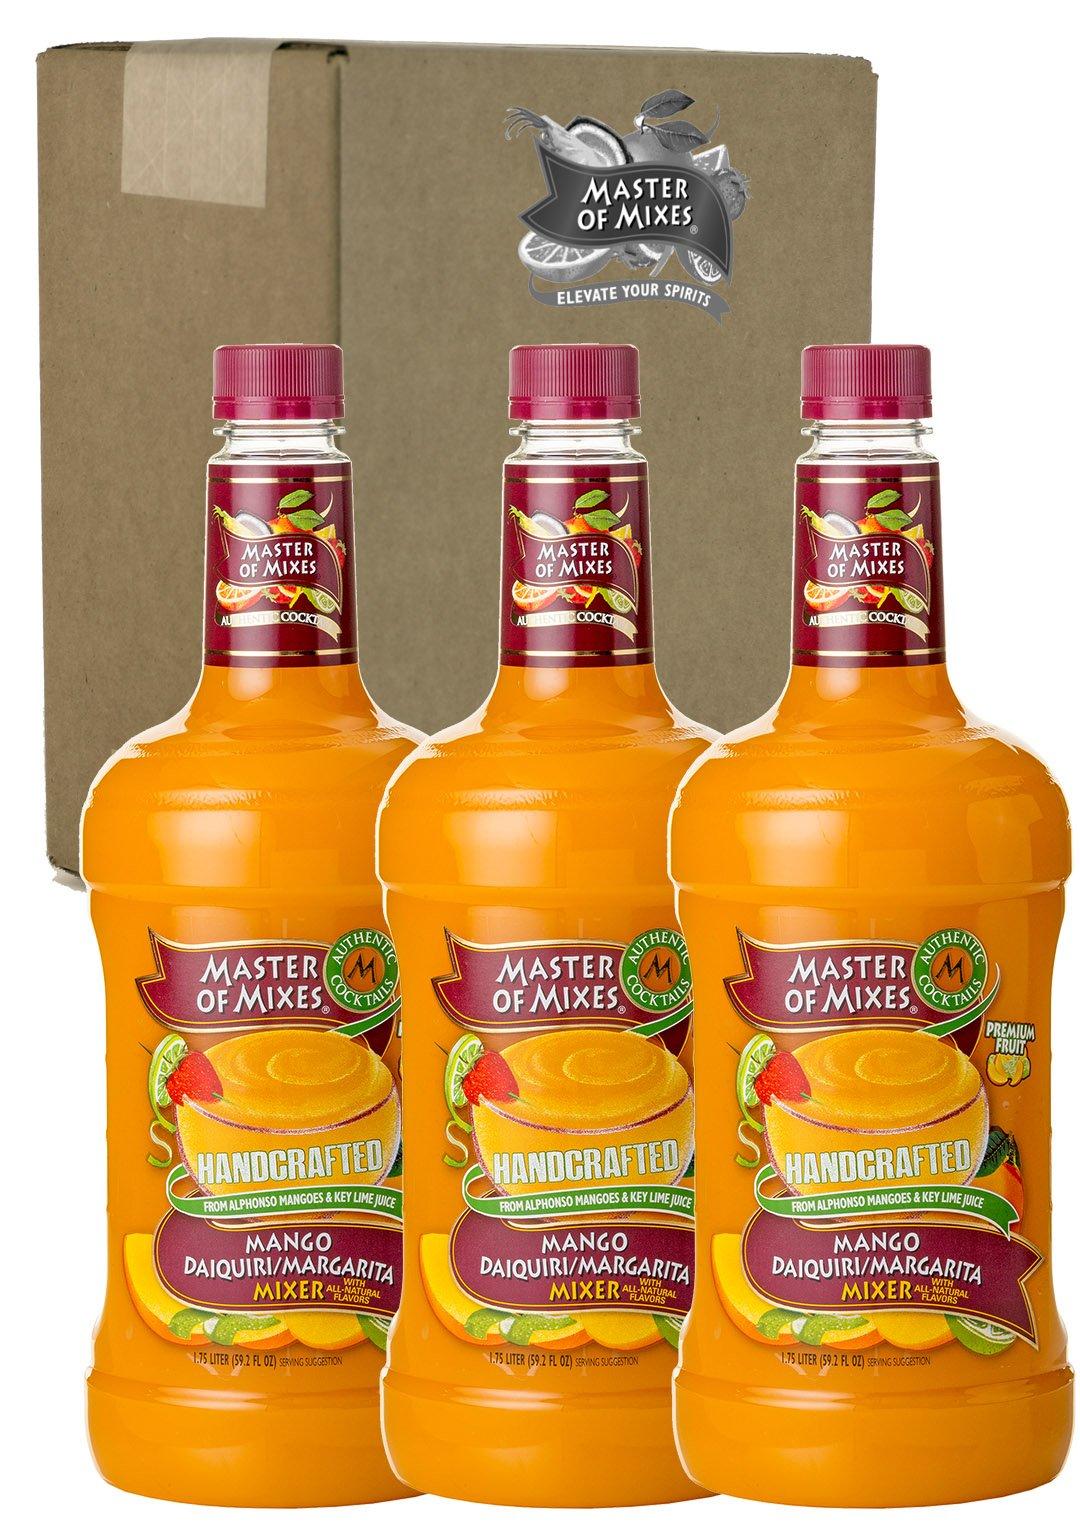 Master of Mixes Mango Daiquiri/Margarita Drink Mix, Ready to Use, 1.75 Liter Bottle (59.2 Fl Oz), Pack of 3